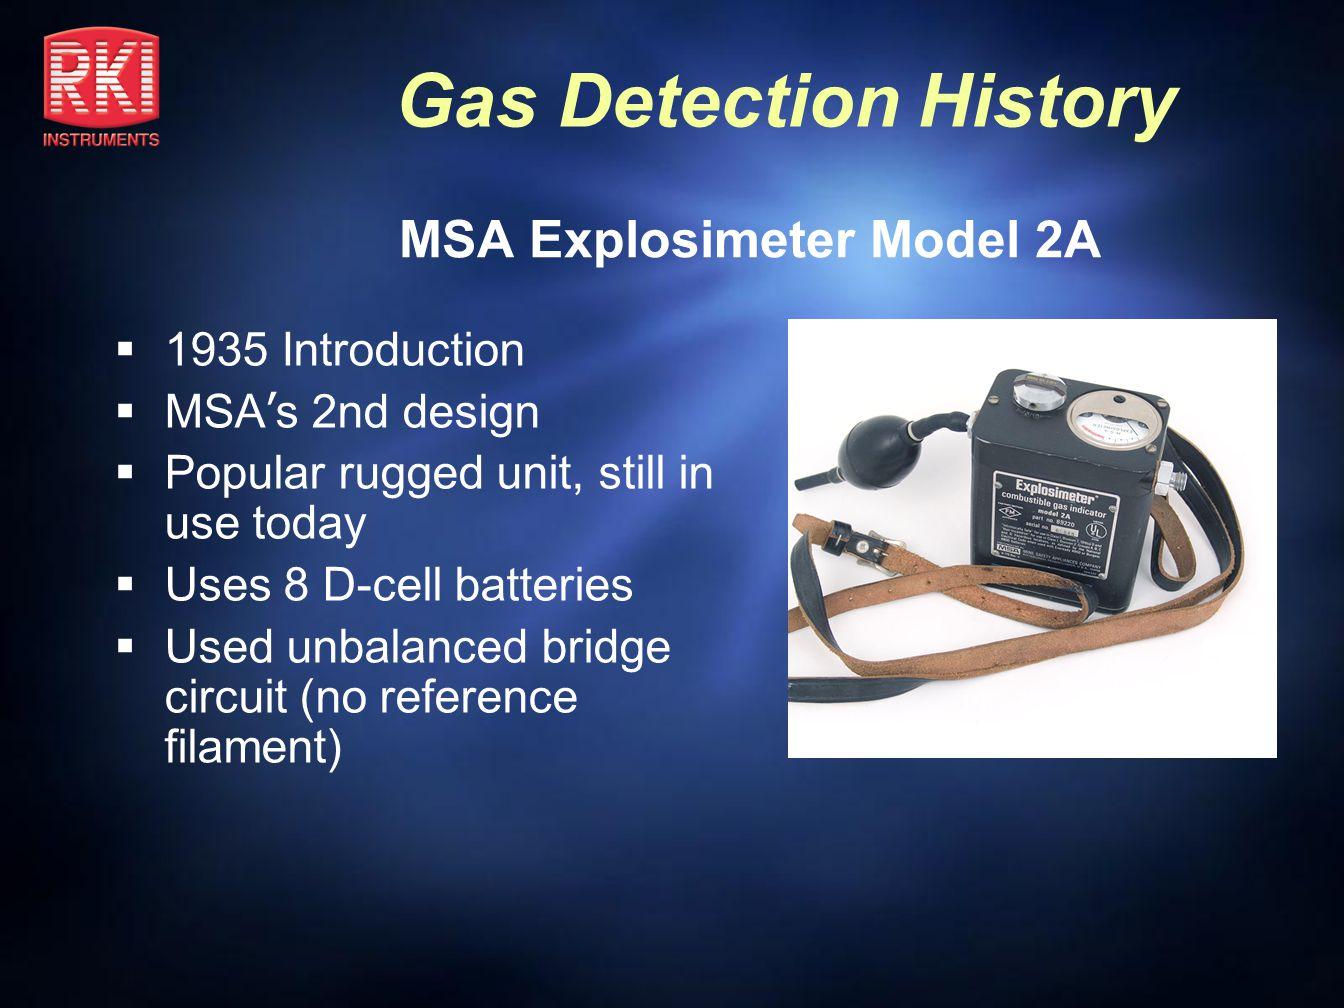 MSA Explosimeter Model 2A